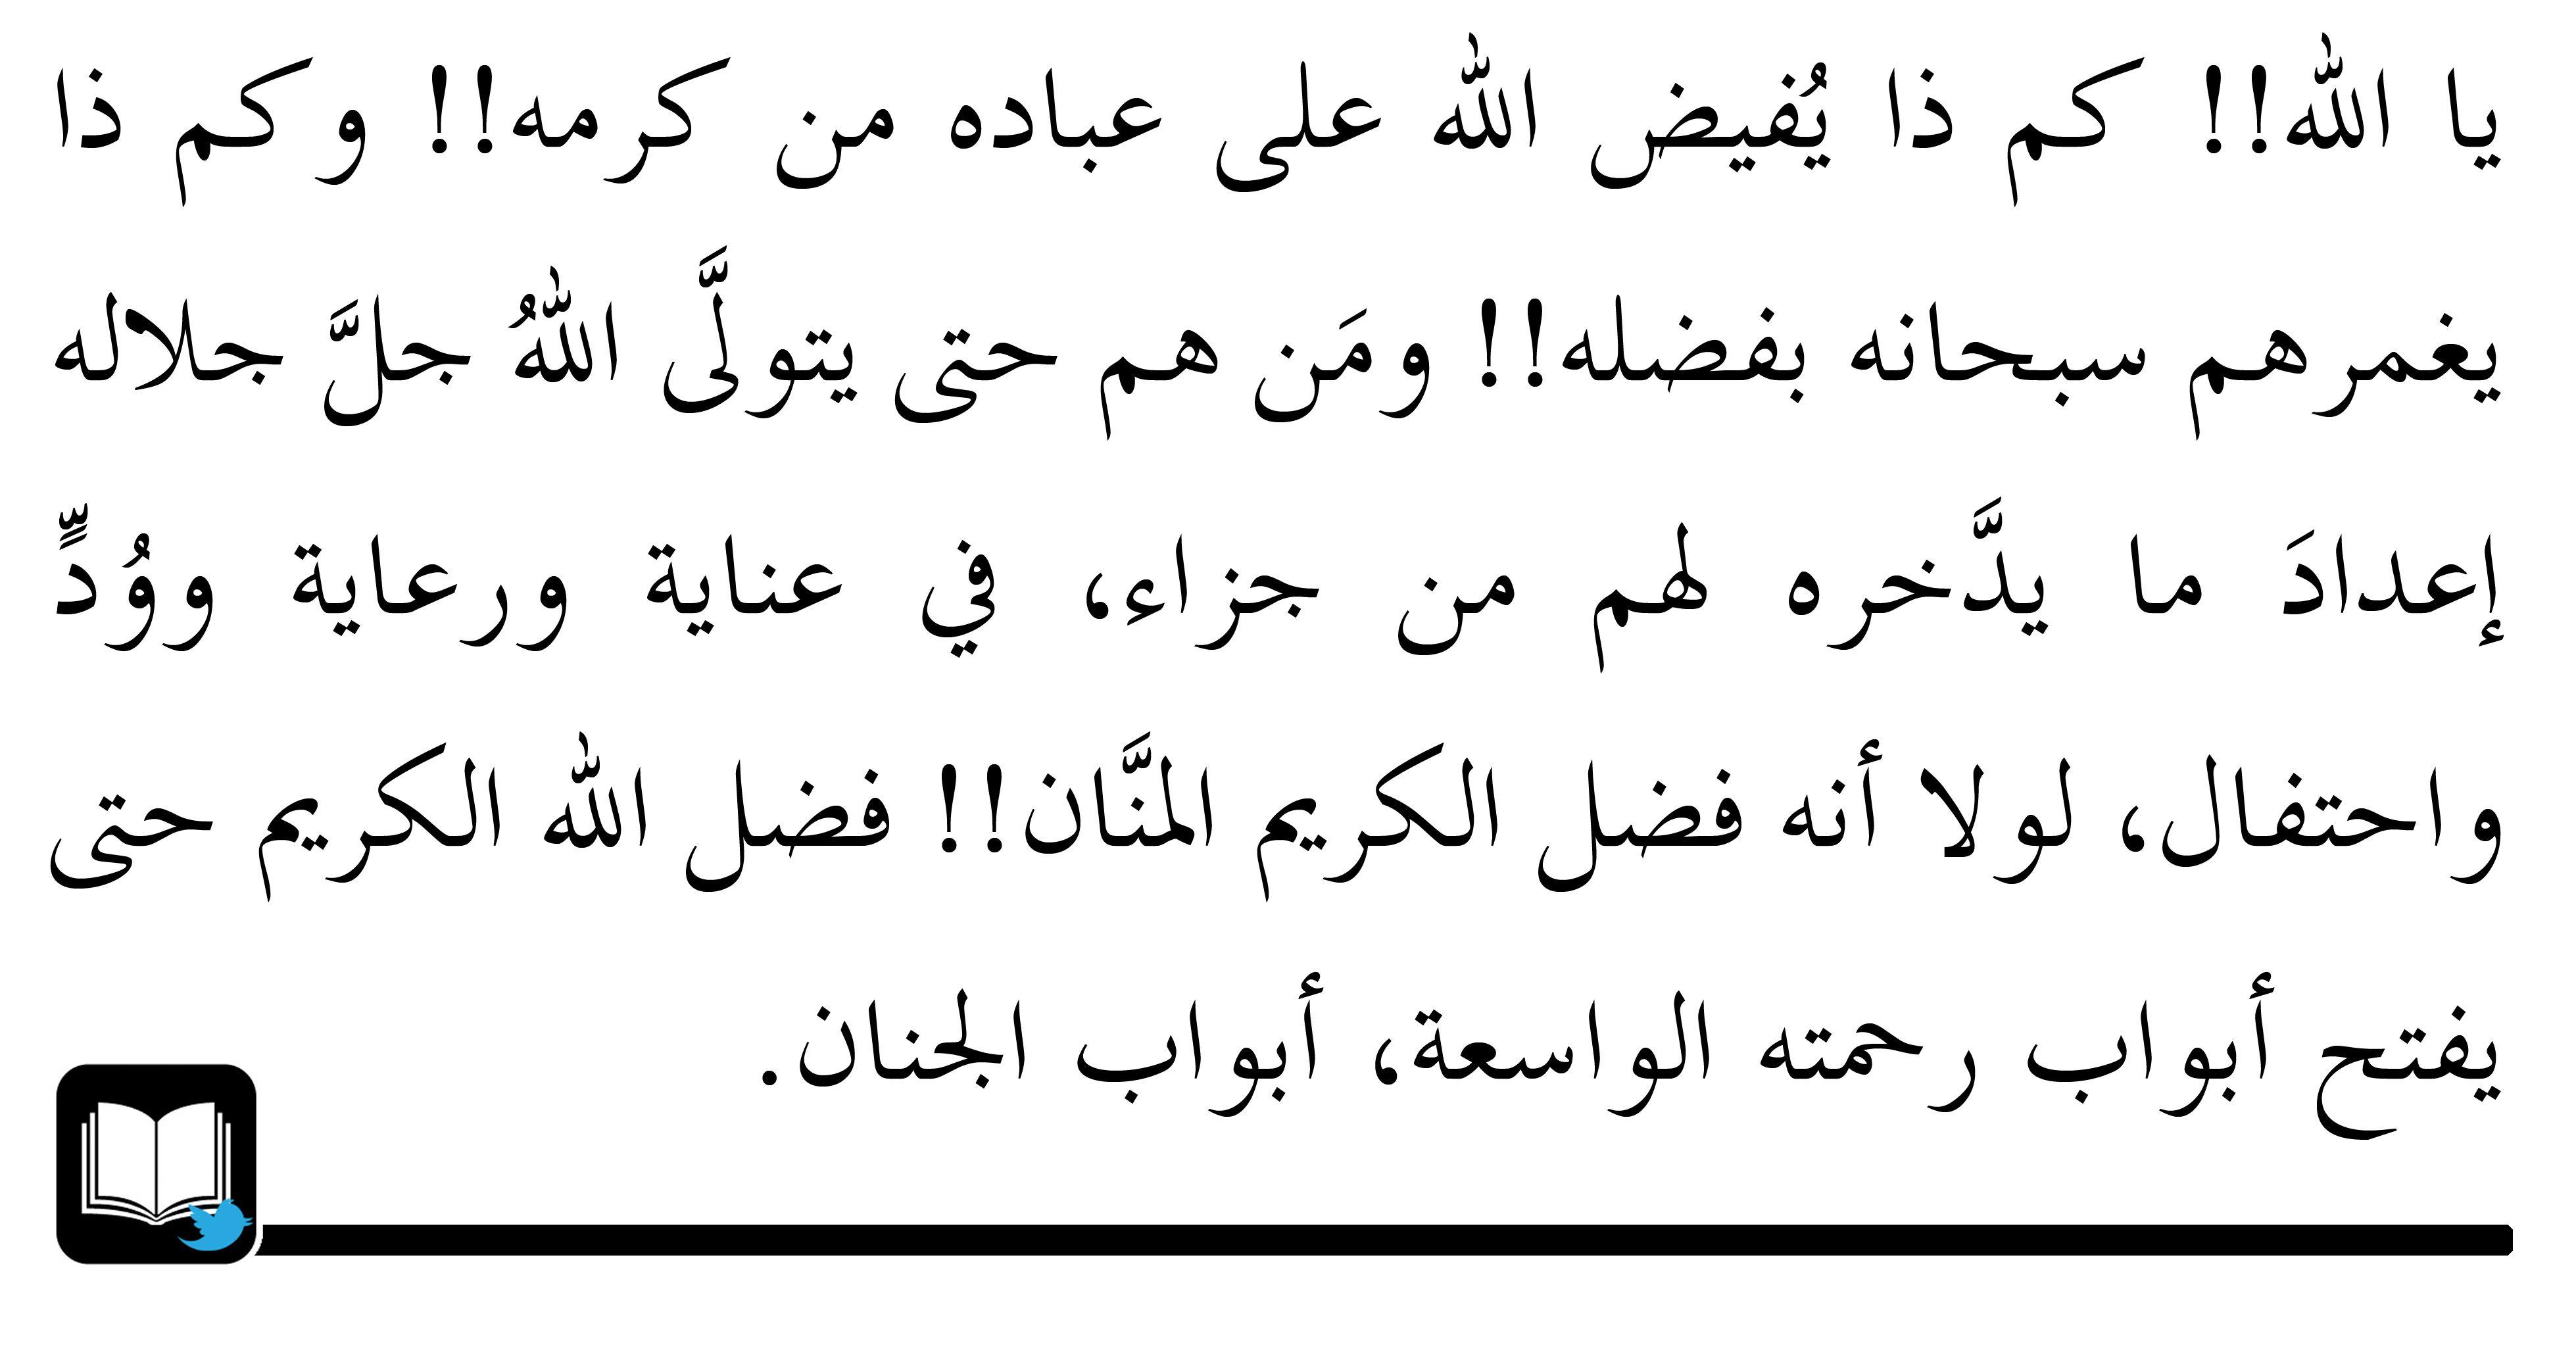 Pin by HuRooF حروف on صلاح الأمة في علو الهمة (With images